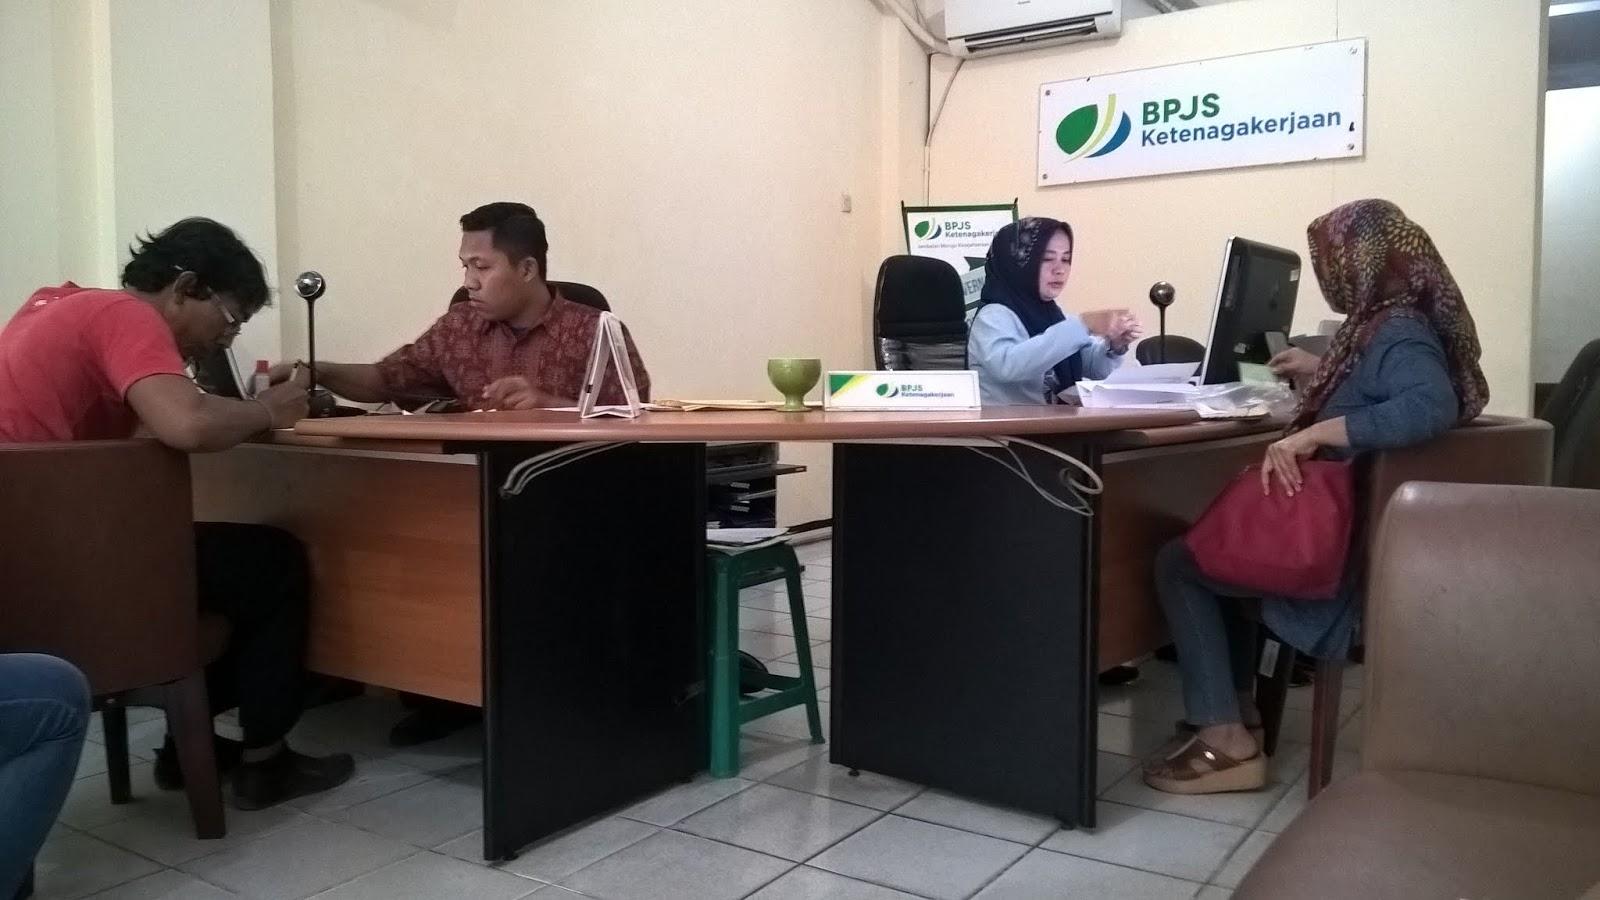 Kantor Bpjs Ketenagakerjaan Marunda Jakarta Utara Djangkaru Bumi